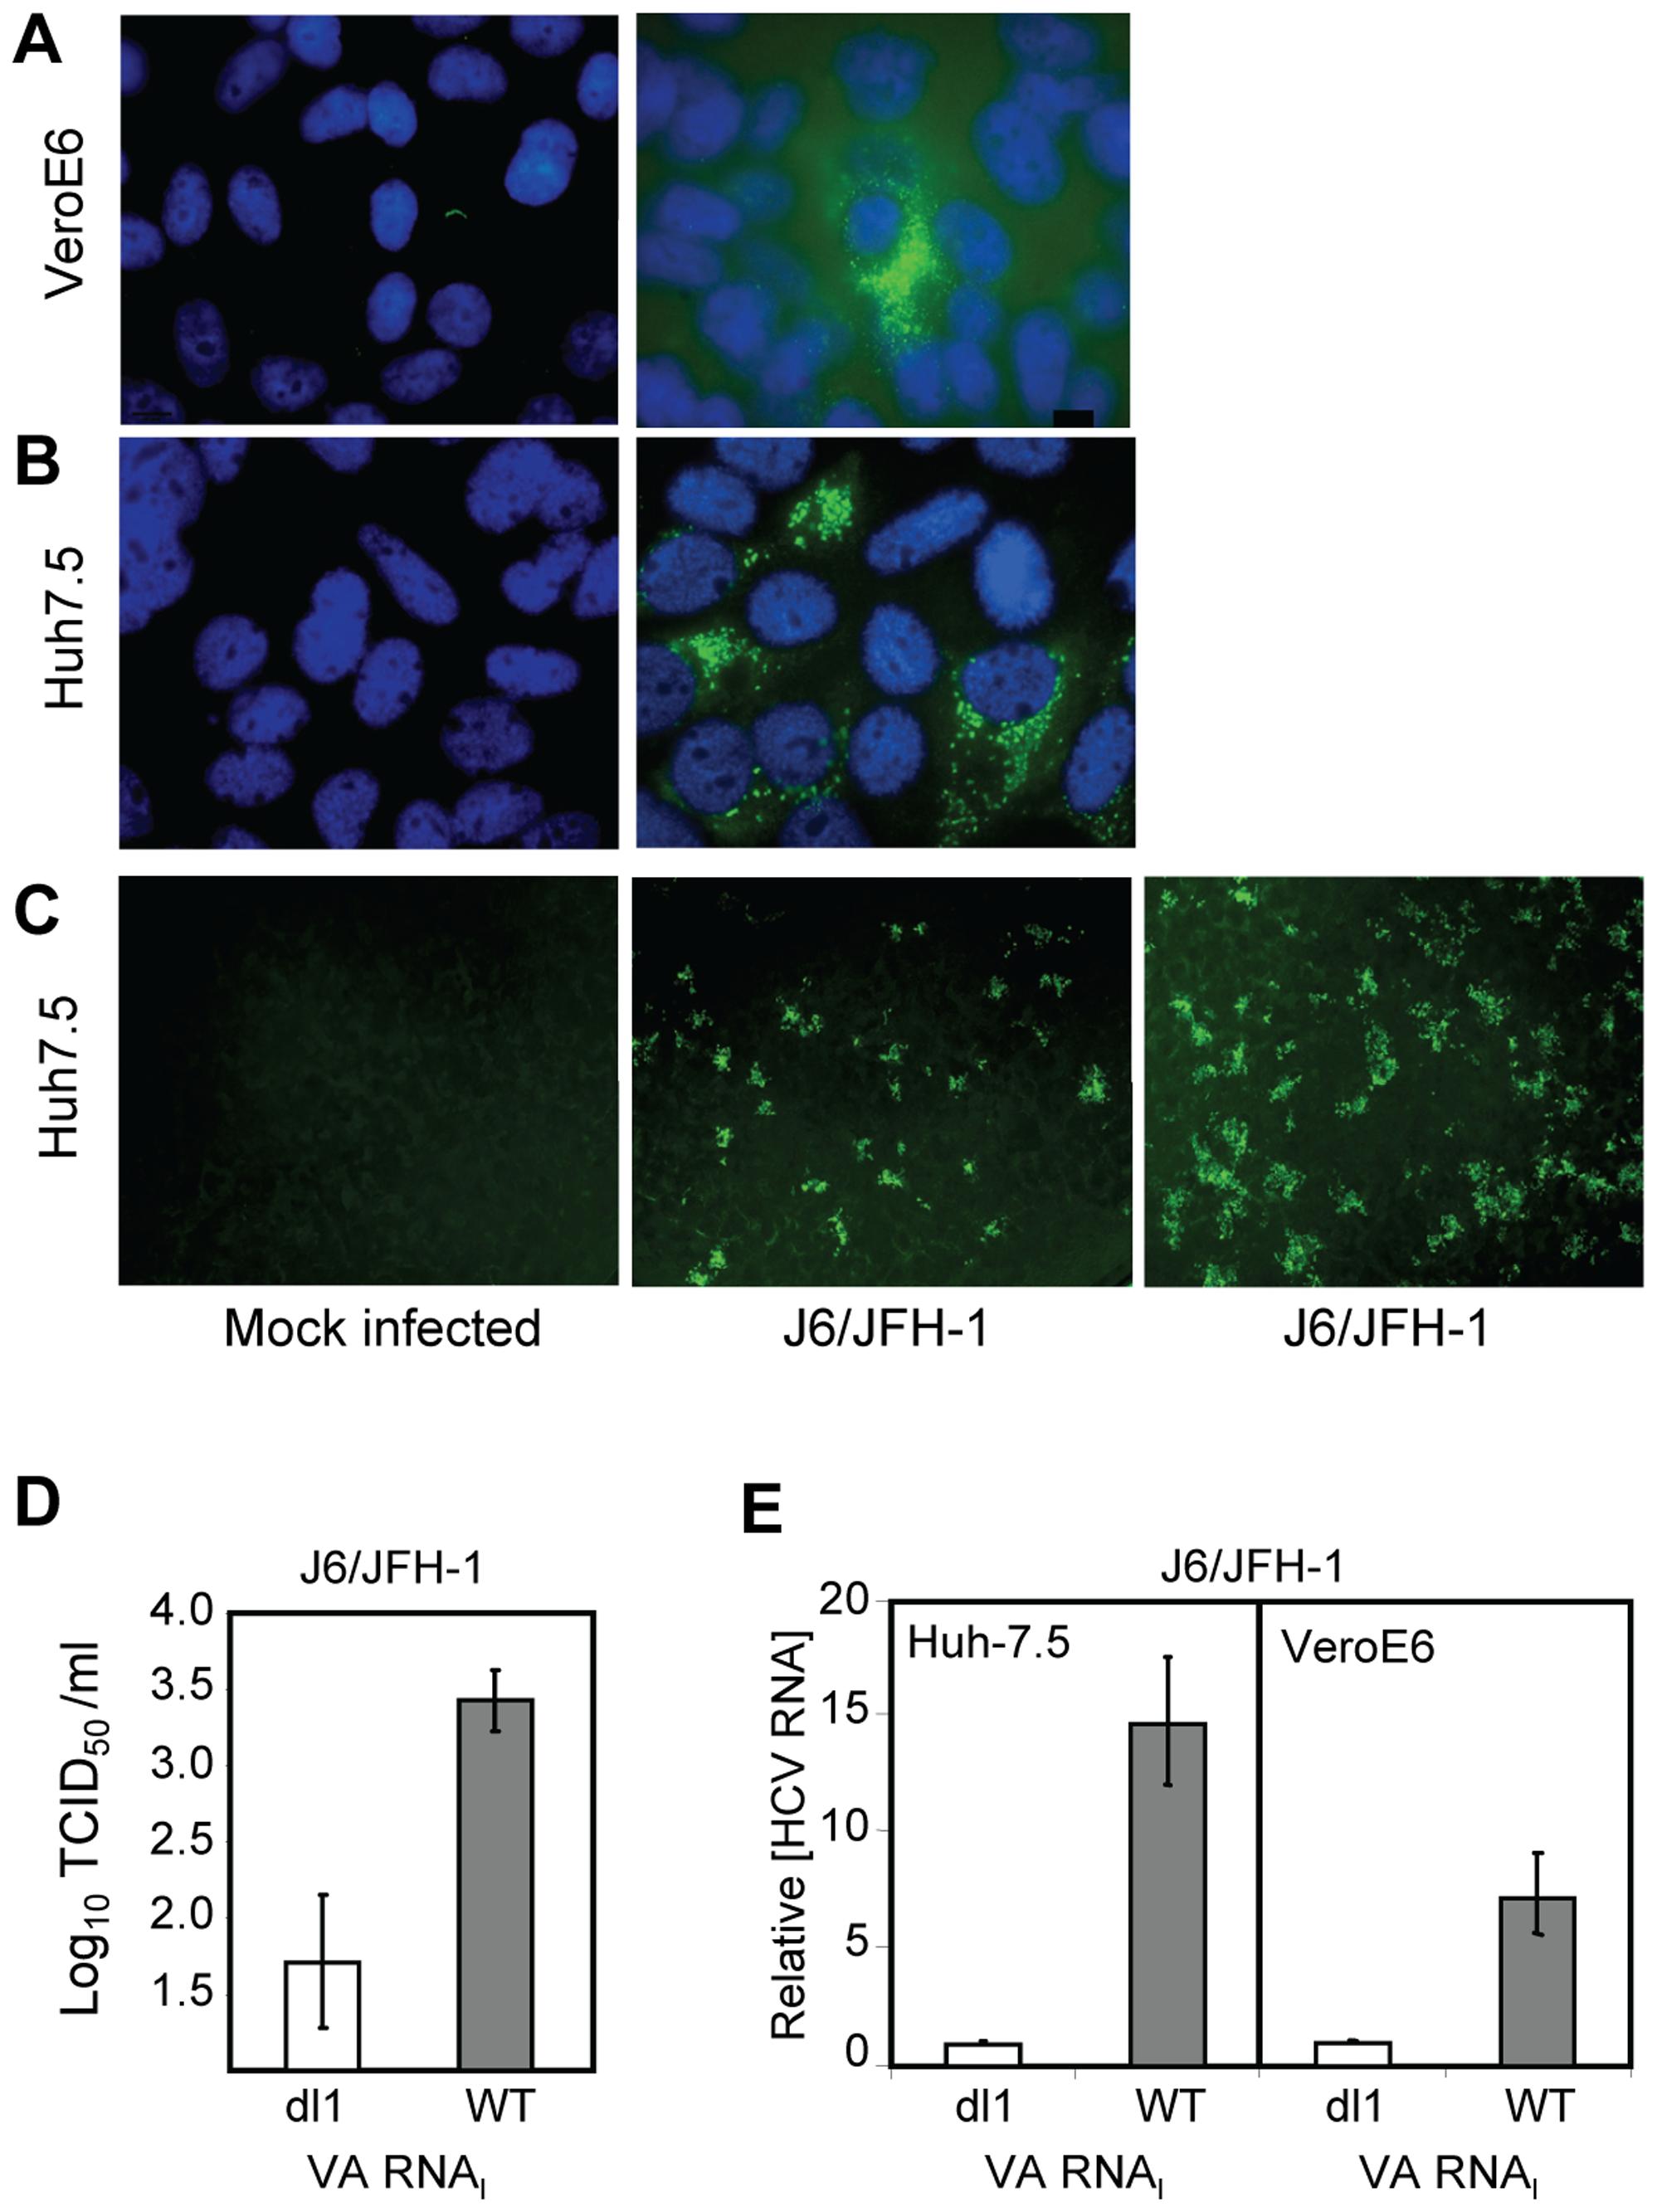 VA RNA<sub>I</sub> stimulates replication of J6/JFH-1.